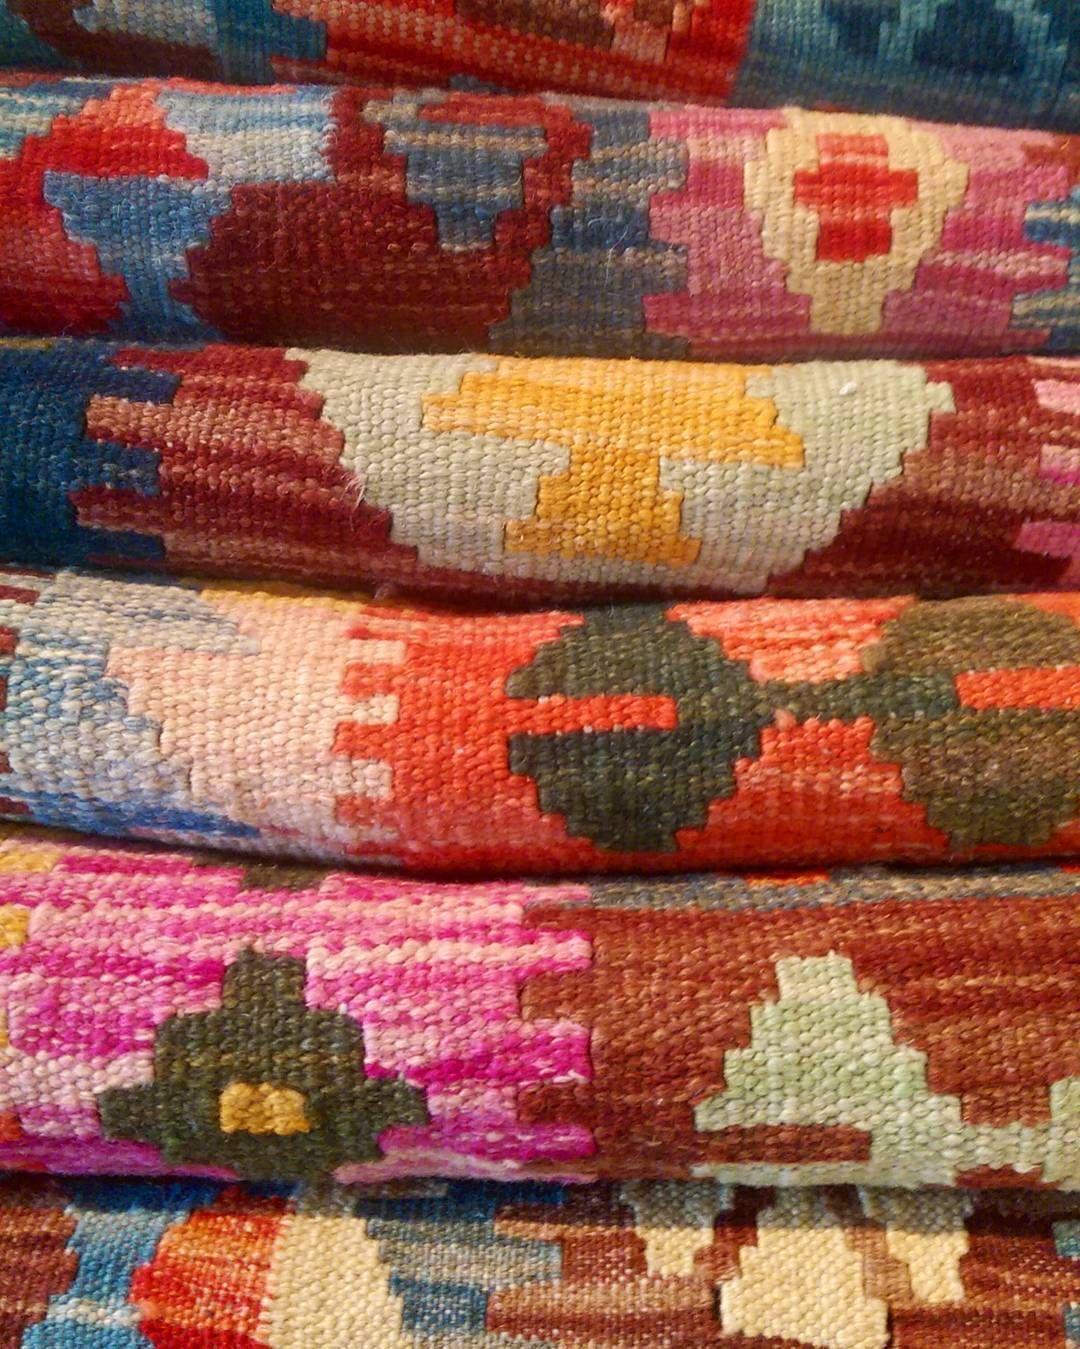 Just in: Our new range of Spring toned veggie dye kilims!  #kilims #colourful #sydney #spring #colourful #interiordesign #decor #homedecor #sydneyinteriors #sydneyspring #bohemian